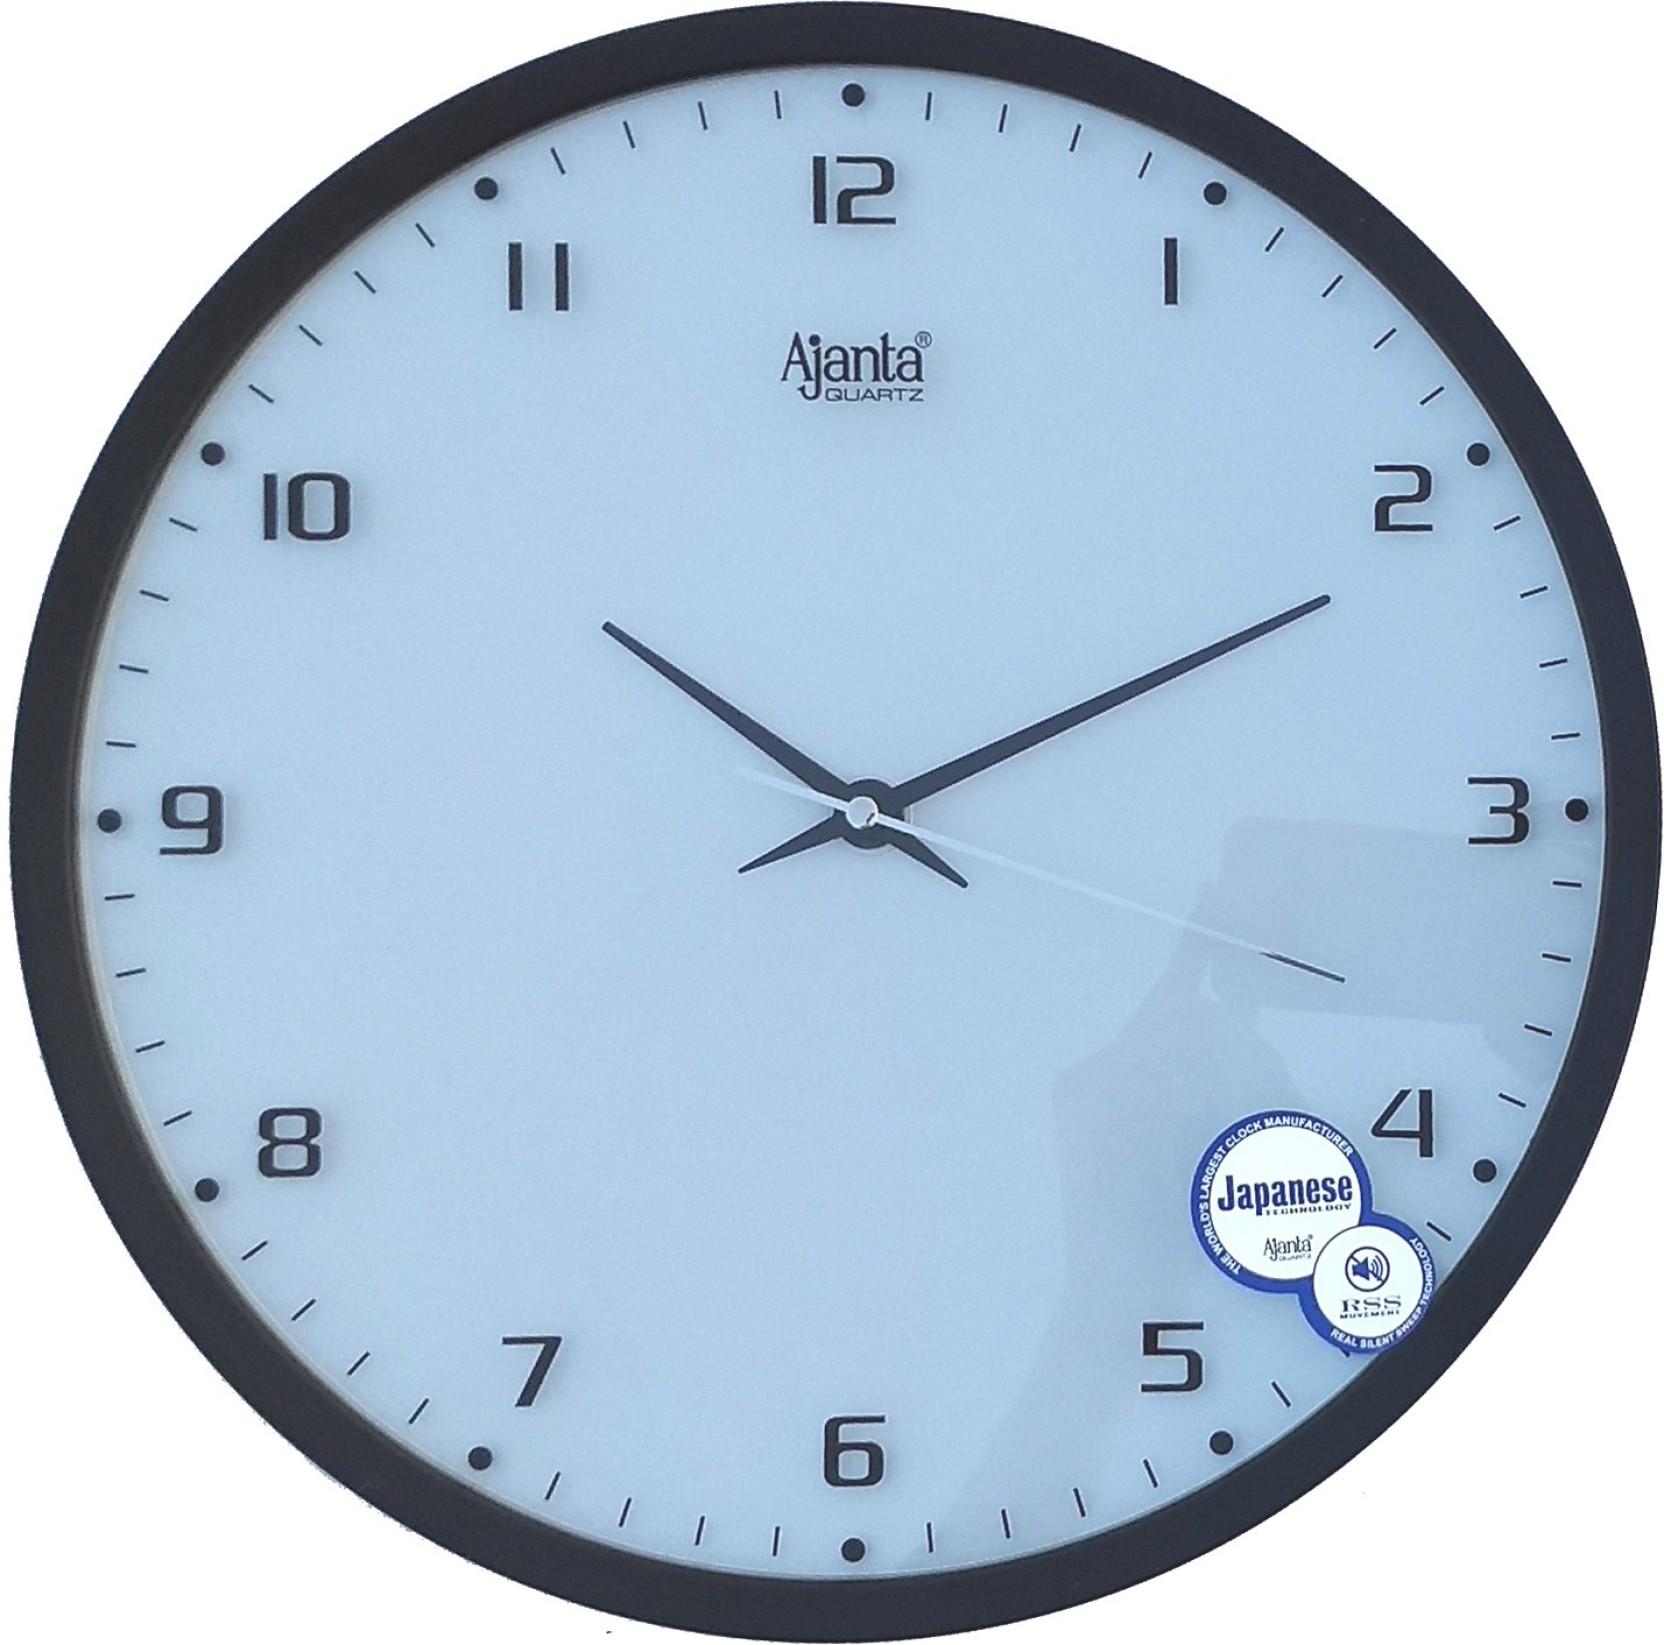 Ajanta analog 31 cm dia wall clock price in india buy ajanta ajanta analog 31 cm dia wall clock add to cart amipublicfo Images